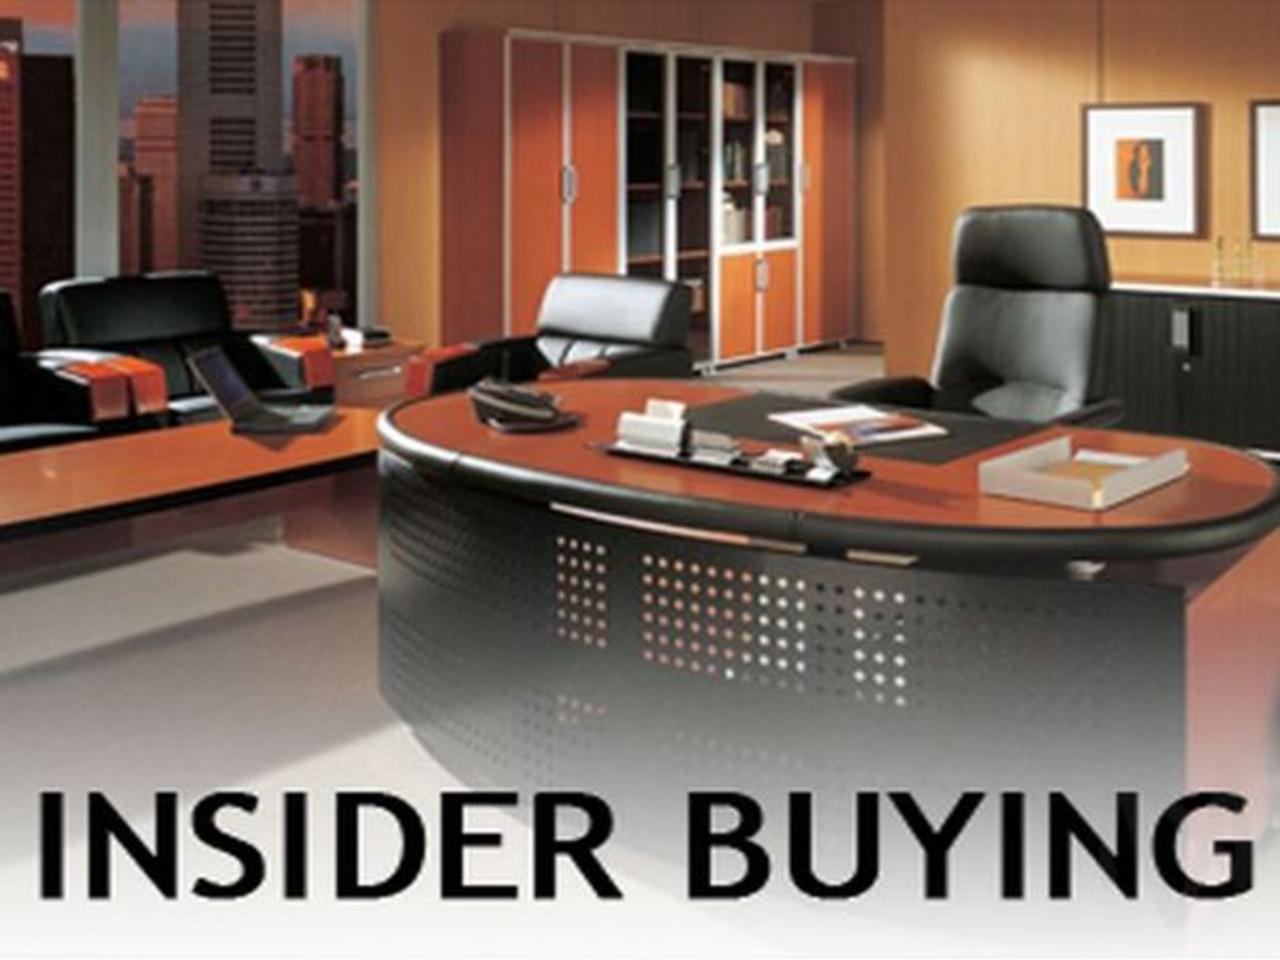 Thursday 6/10 Insider Buying Report: UWMC, WLMS